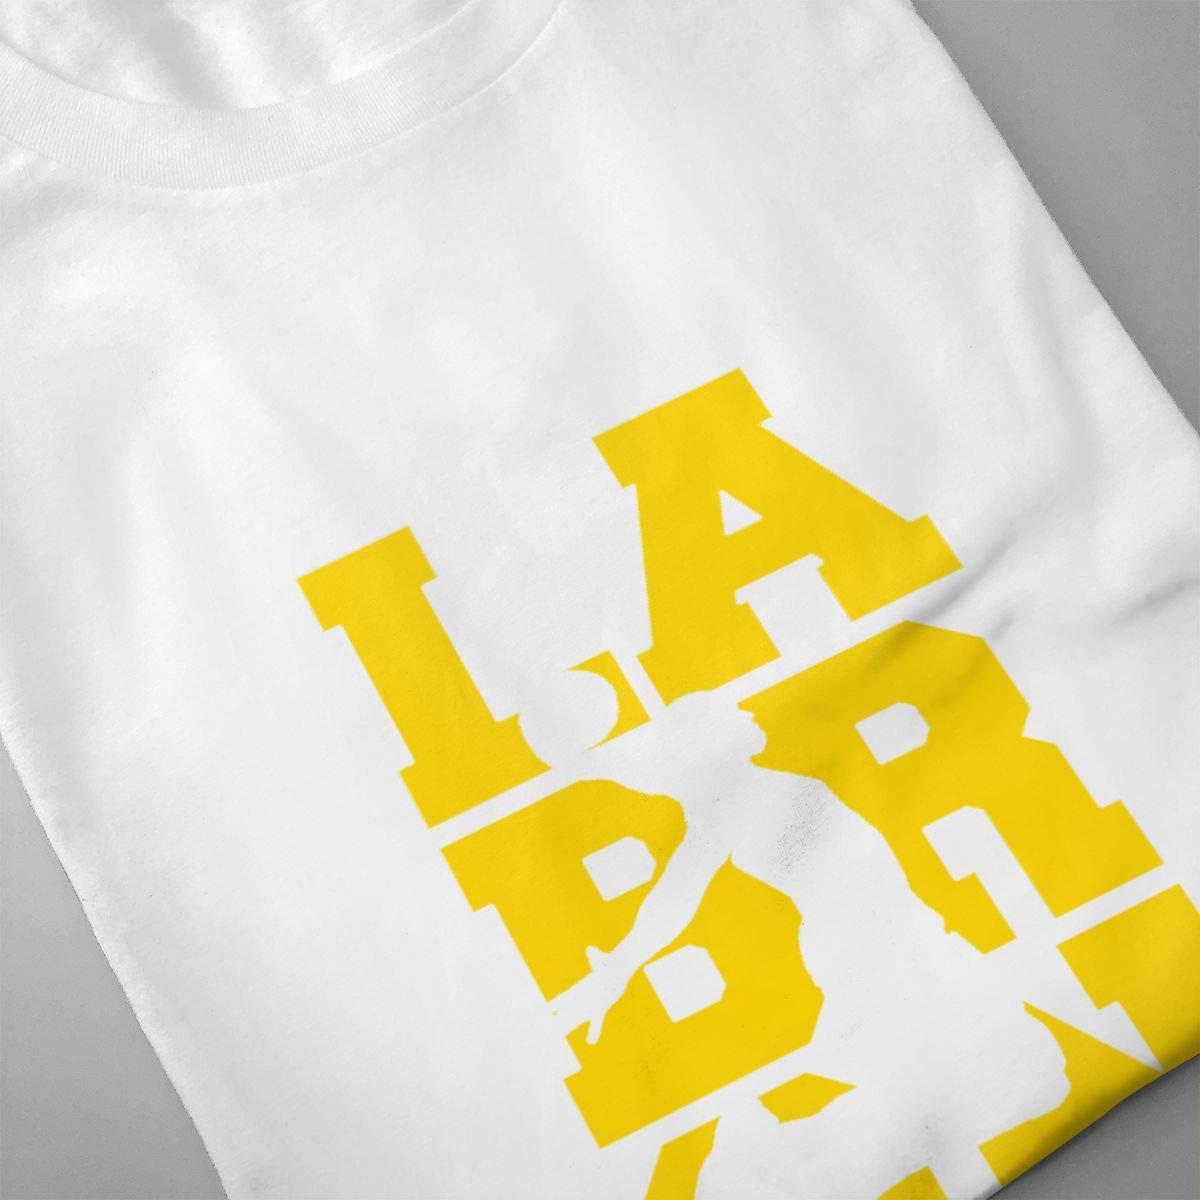 new arrival 04142 eb0b9 DLAZANA 2K19 King LAbron James Lakers Mens LBJ Shirt ...